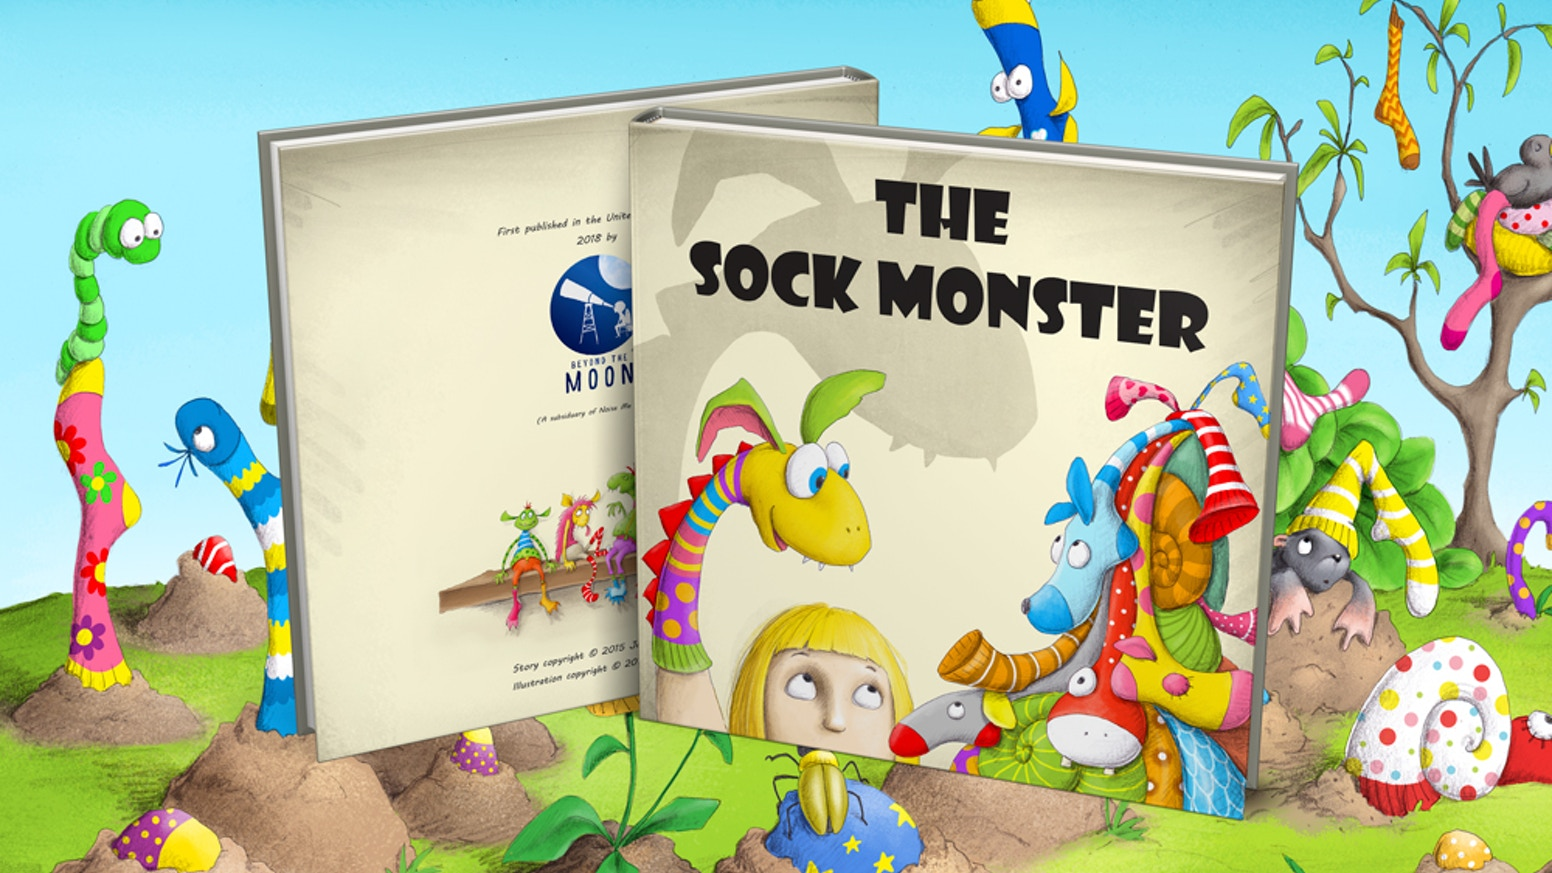 A Children's Book About Friendship, Creativity & Fun by